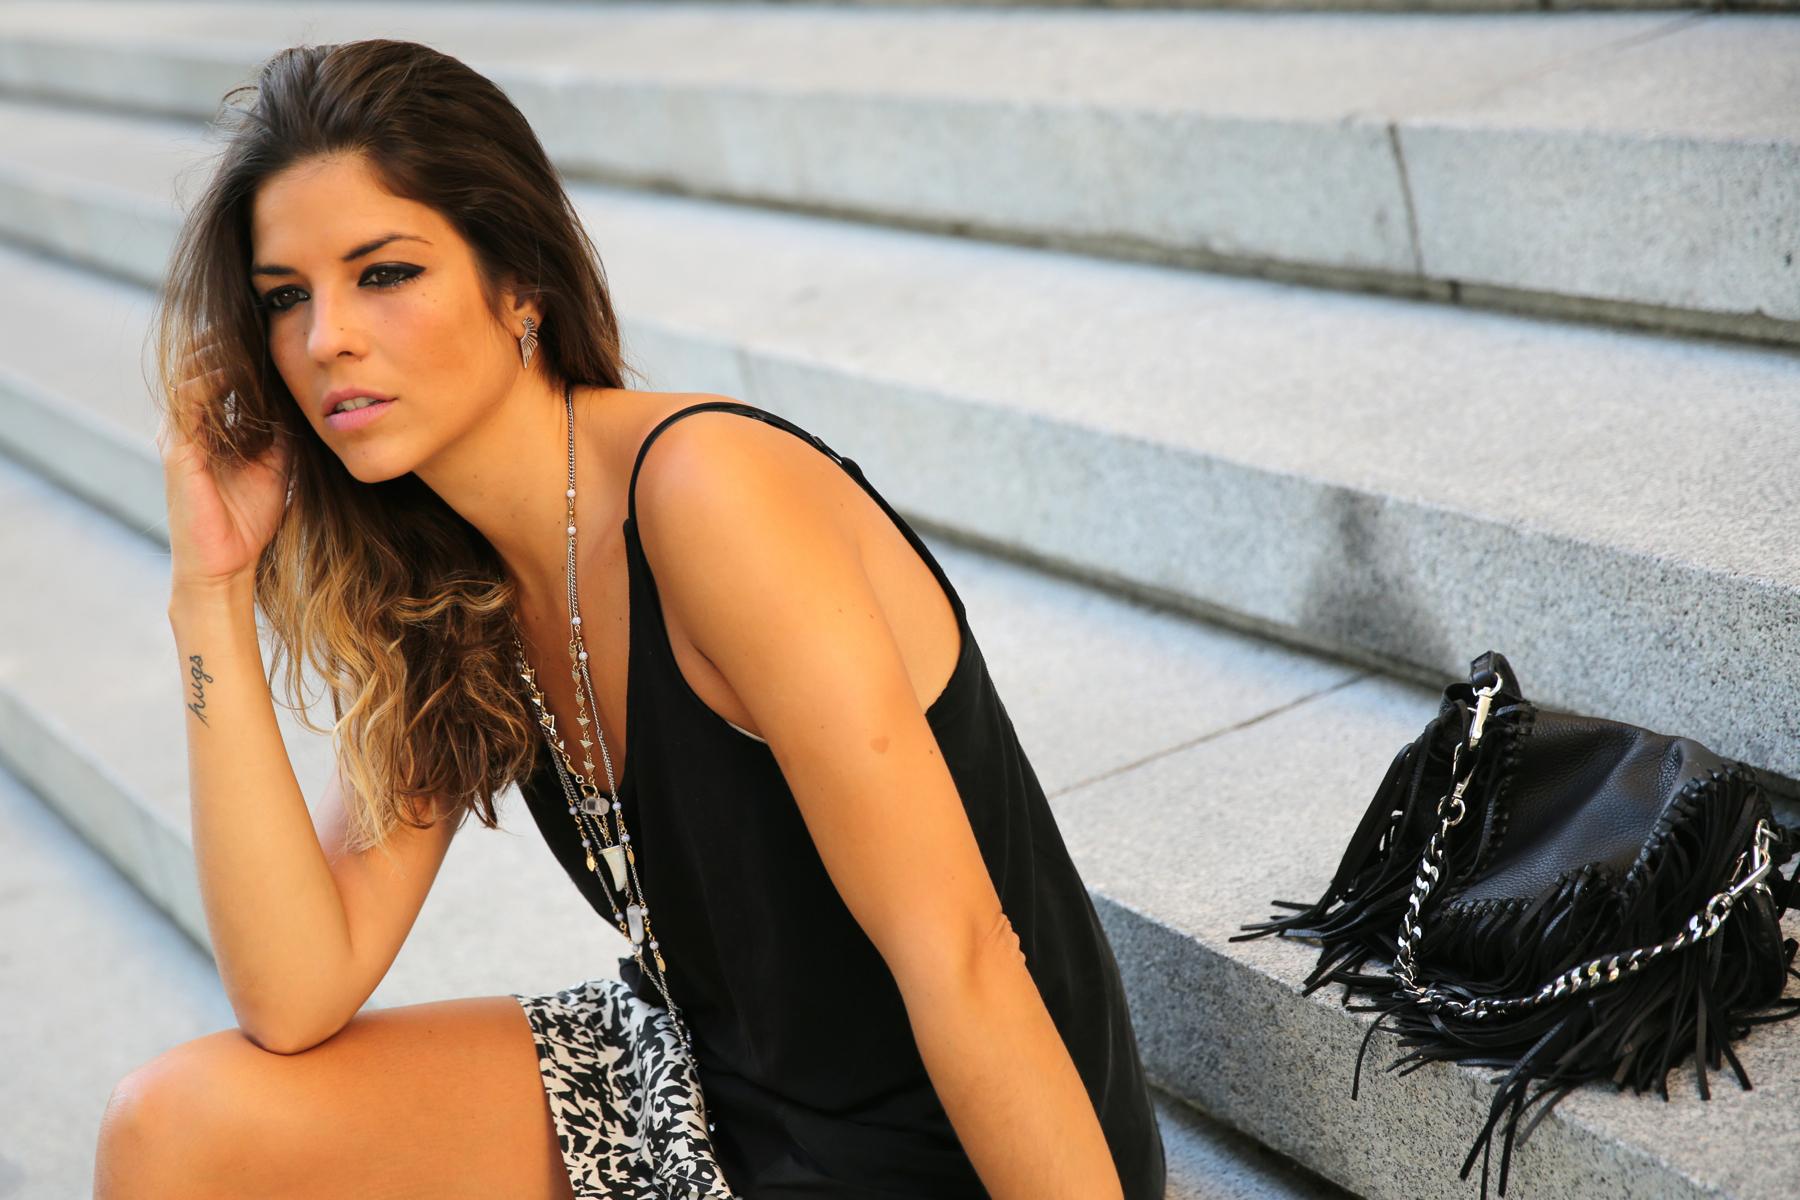 trendy_taste-look-outfit-street_style-ootd-blog-blogger-fashion_spain-moda_españa-animal_print-boho-casual-falda-skirt-black_booties-botines_negros-jeffrey_campbell-zara-bolso_flecos-vintage-10